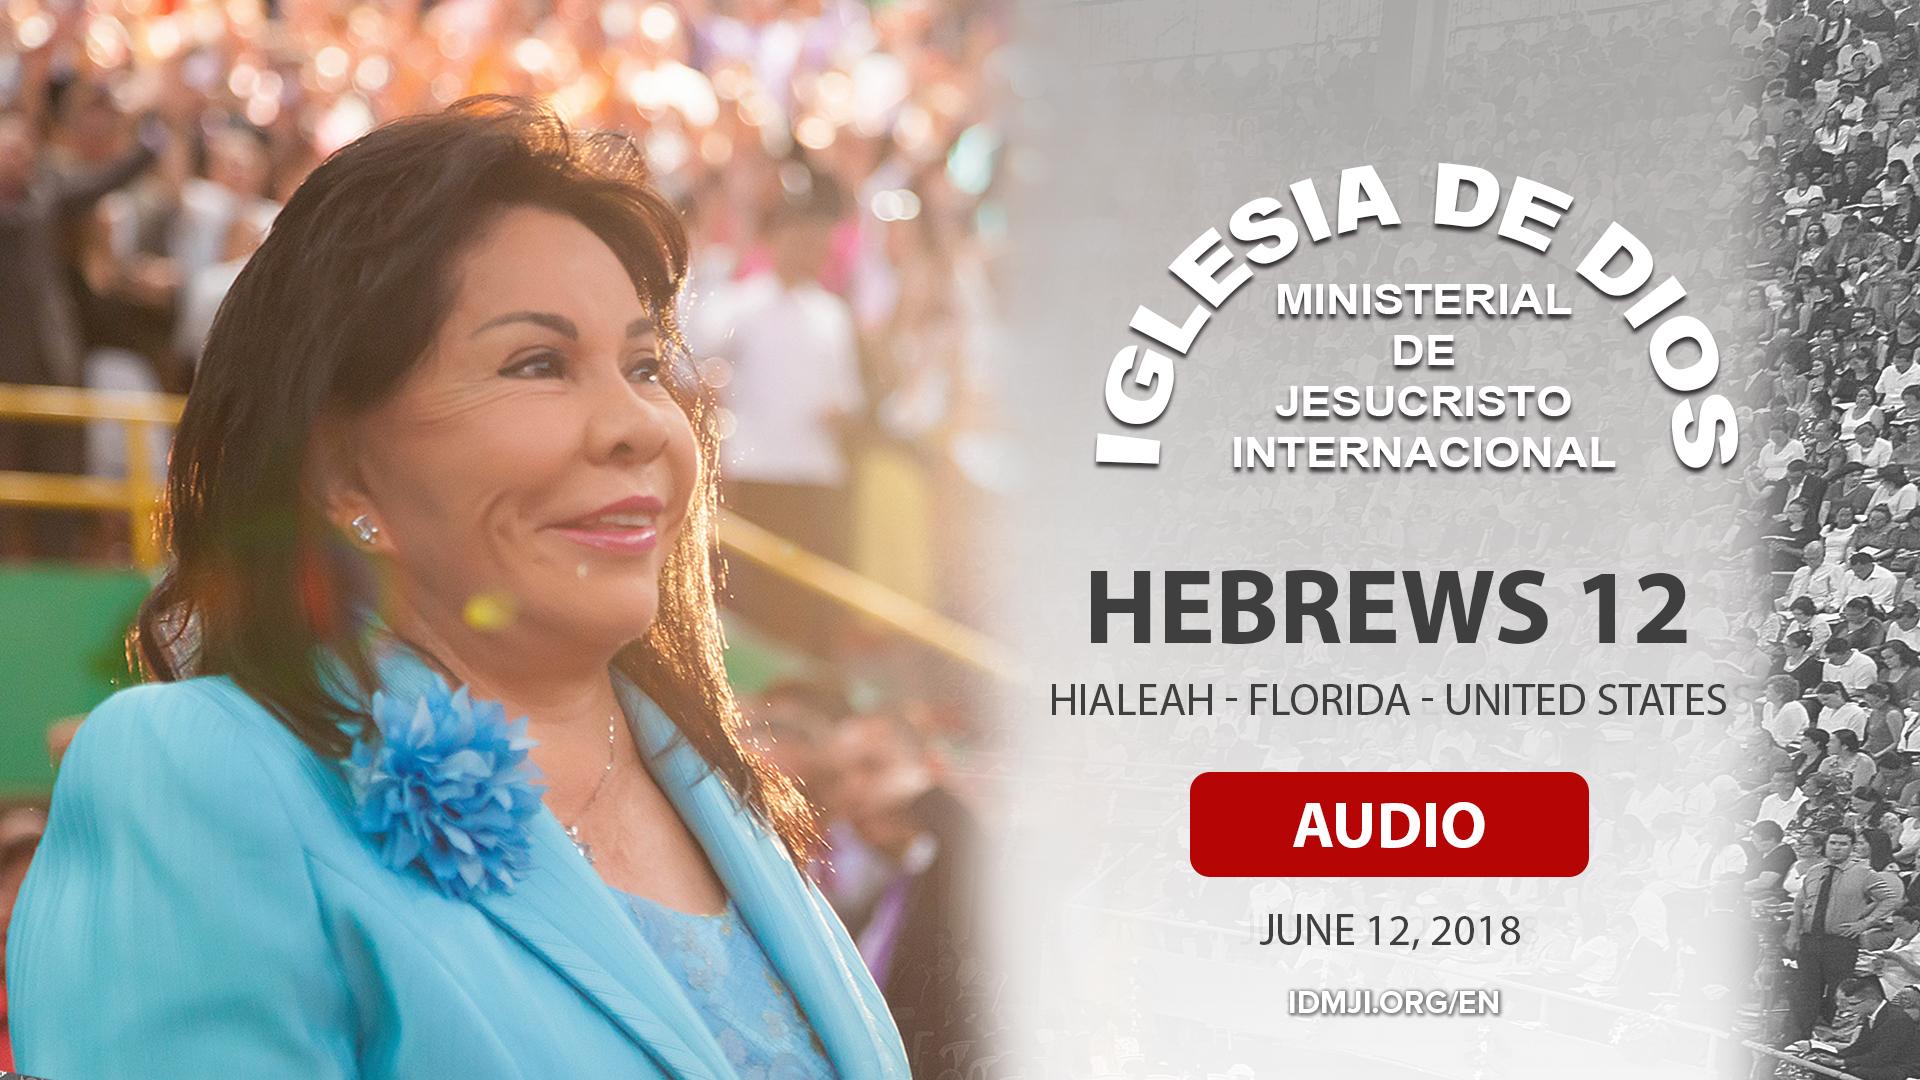 Audio: Hebrews 12 – Hialeah, Florida, USA